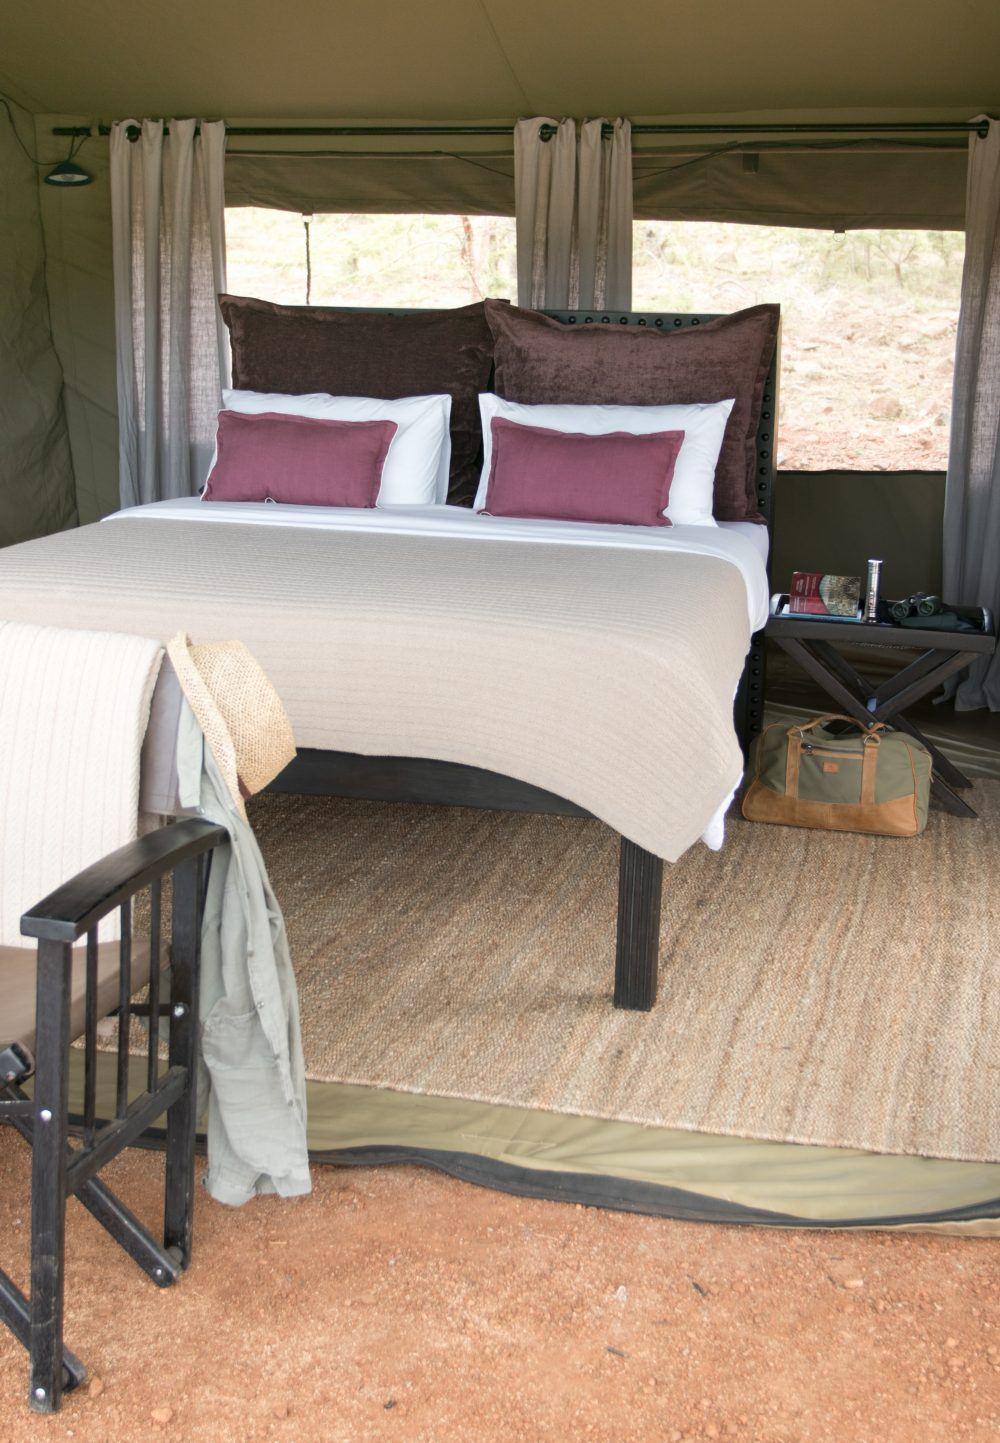 Dobbeltelt på Wilderness Camp Mara Naboisho Kenya